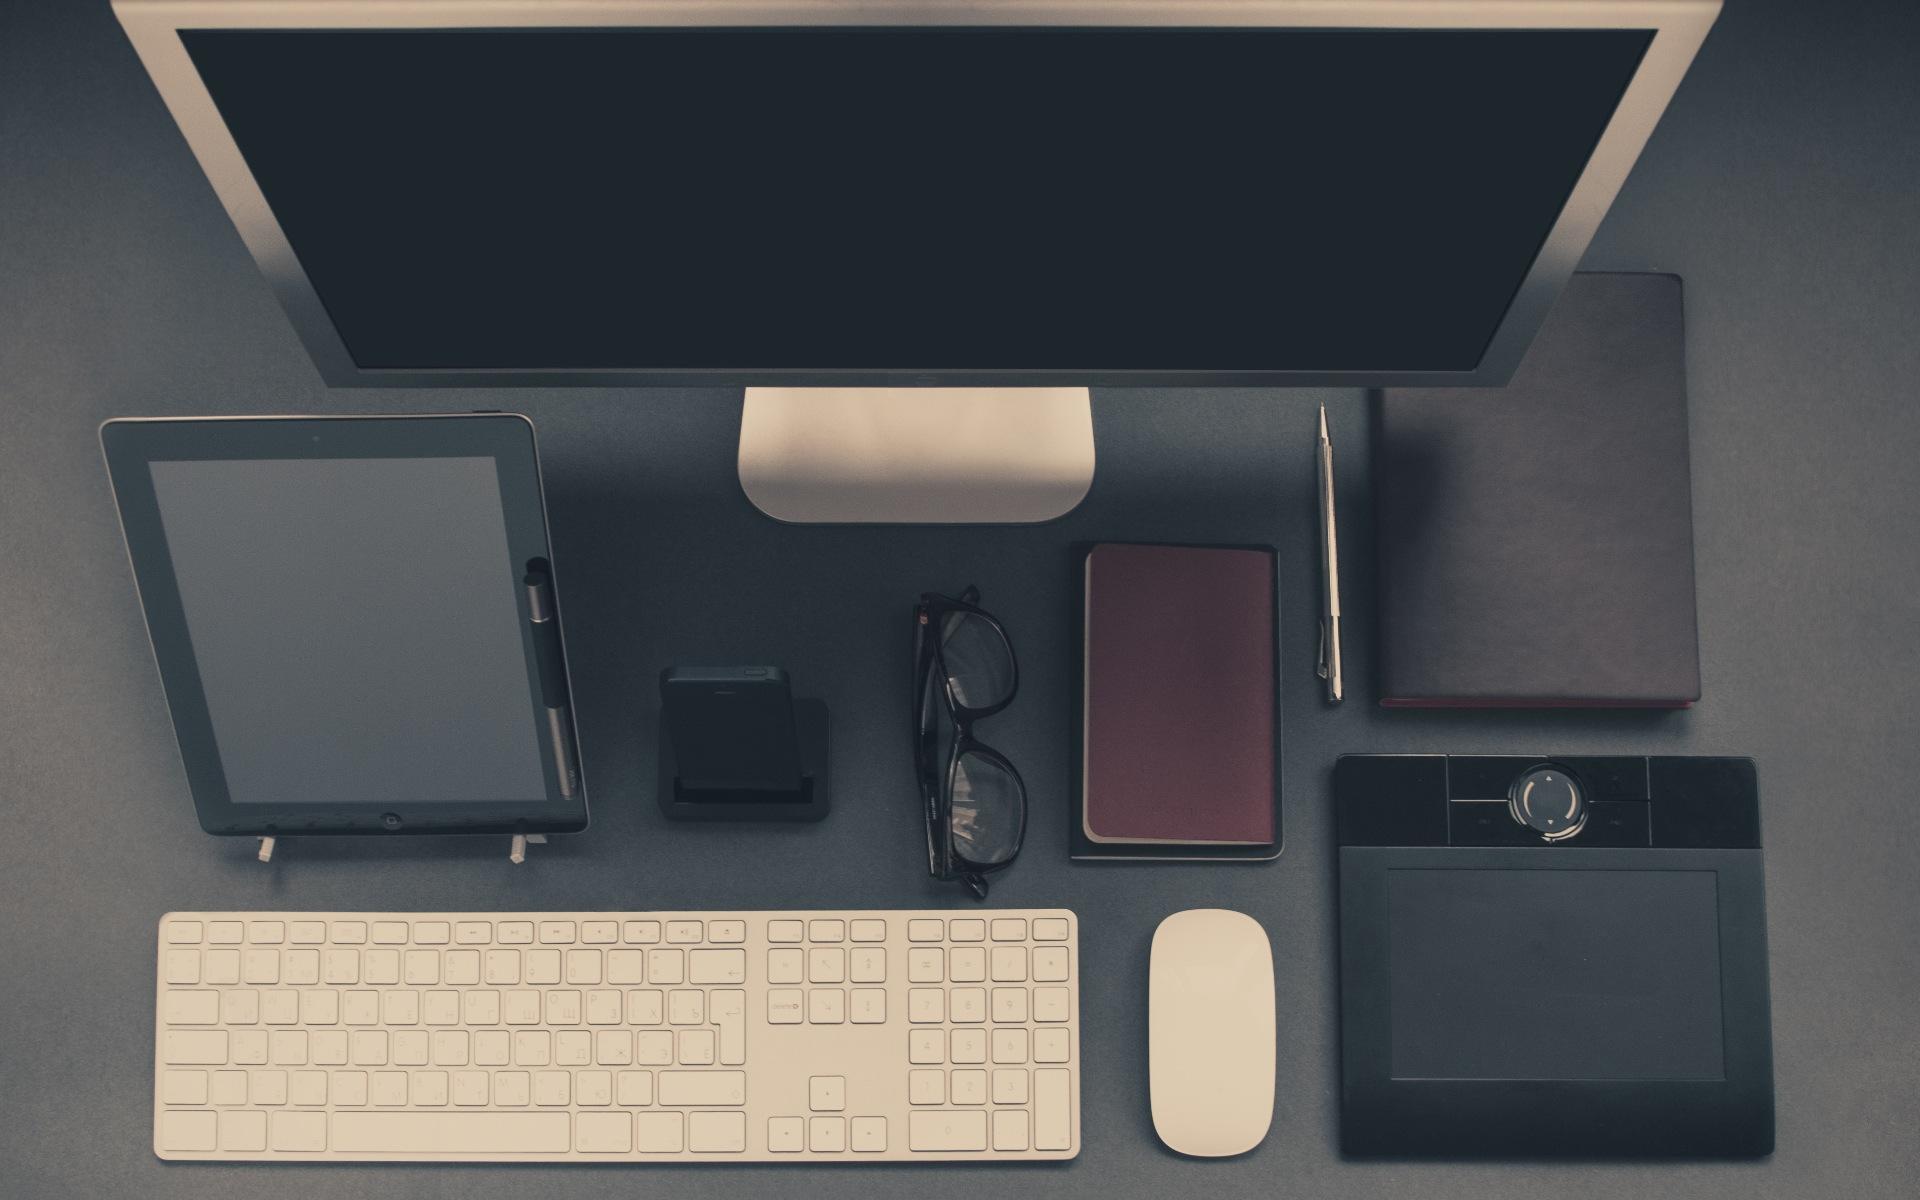 Desktop, Ufficio, computer, Mac, Compressa, iPad, iPhone, tastiera, mouse - Sfondi HD - Professor-falken.com